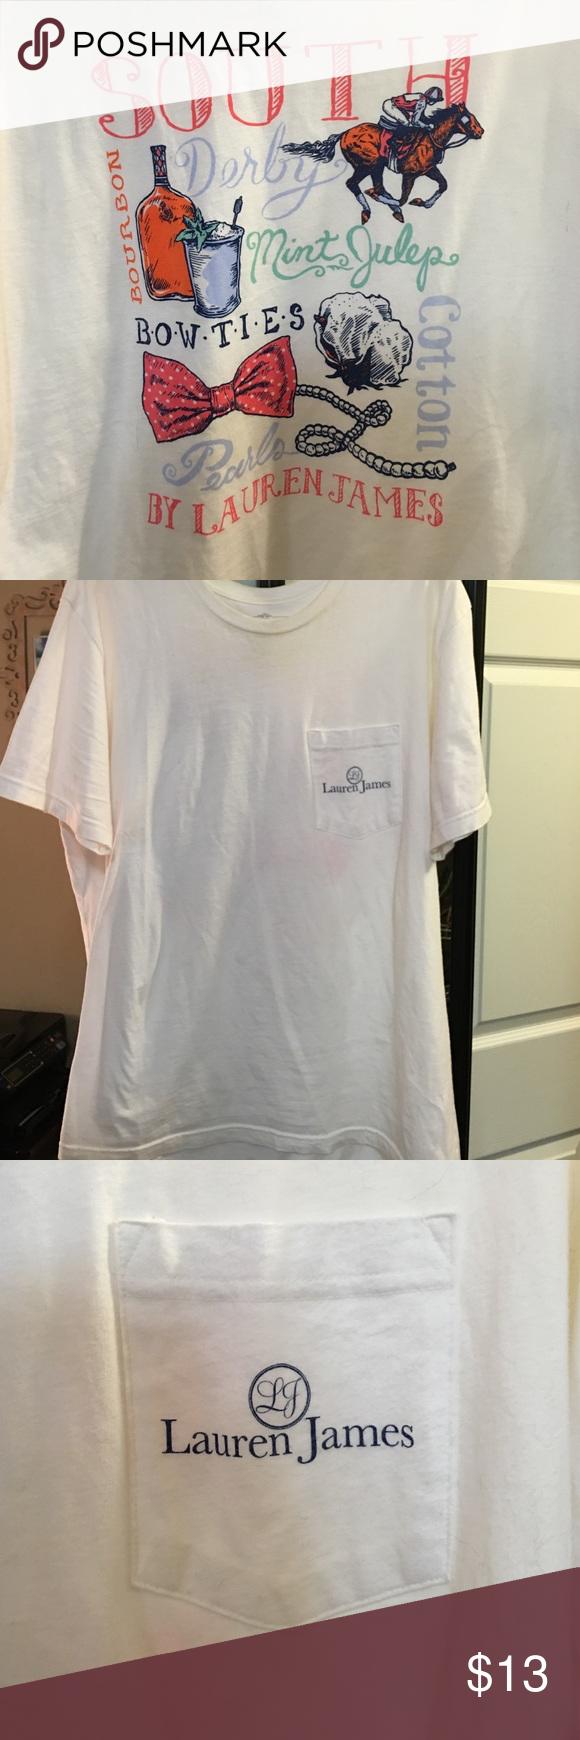 Lauren James Southern Tee Perfect southern t shirt, front pocket, colorful back design Lauren James Tops Tees - Short Sleeve